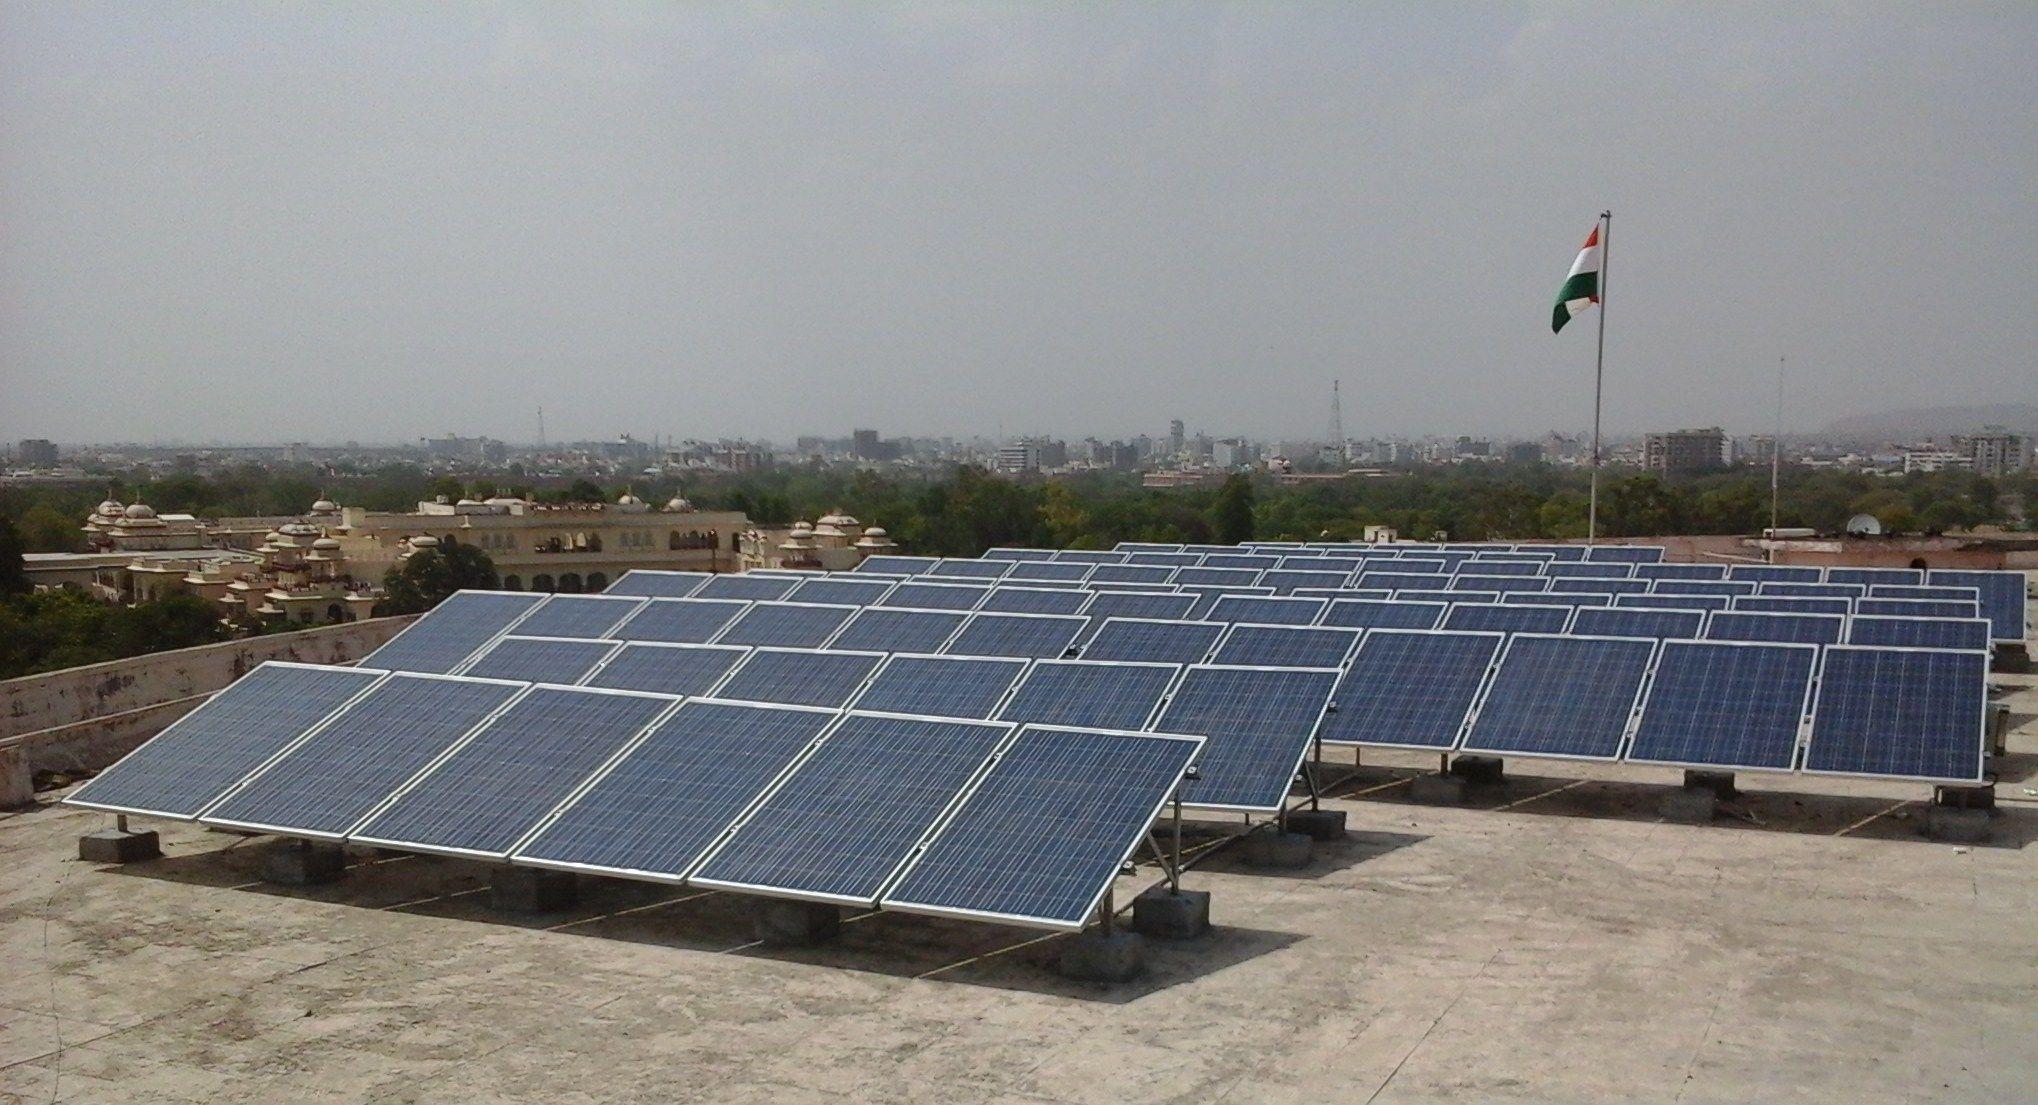 Adb To Provide India 500 Million For Solarrooftop Systems Solarenergy Https Adalidda Net Posts 38egombe4gaajrx6c Adb T Roof Solar Panel Solar Roof Solar